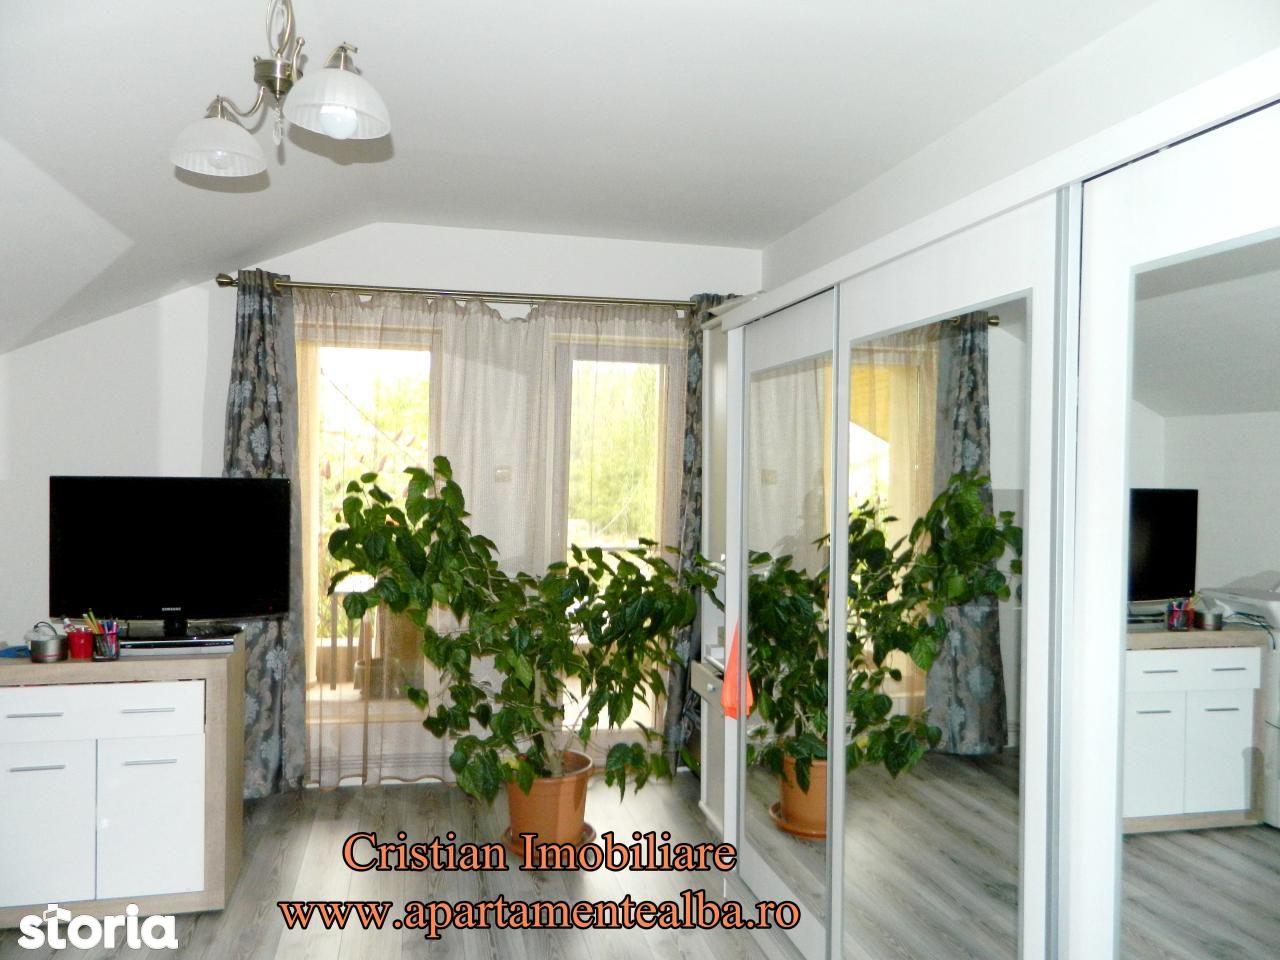 Casa de vanzare, Alba Iulia, Alba, Cetate - Foto 10